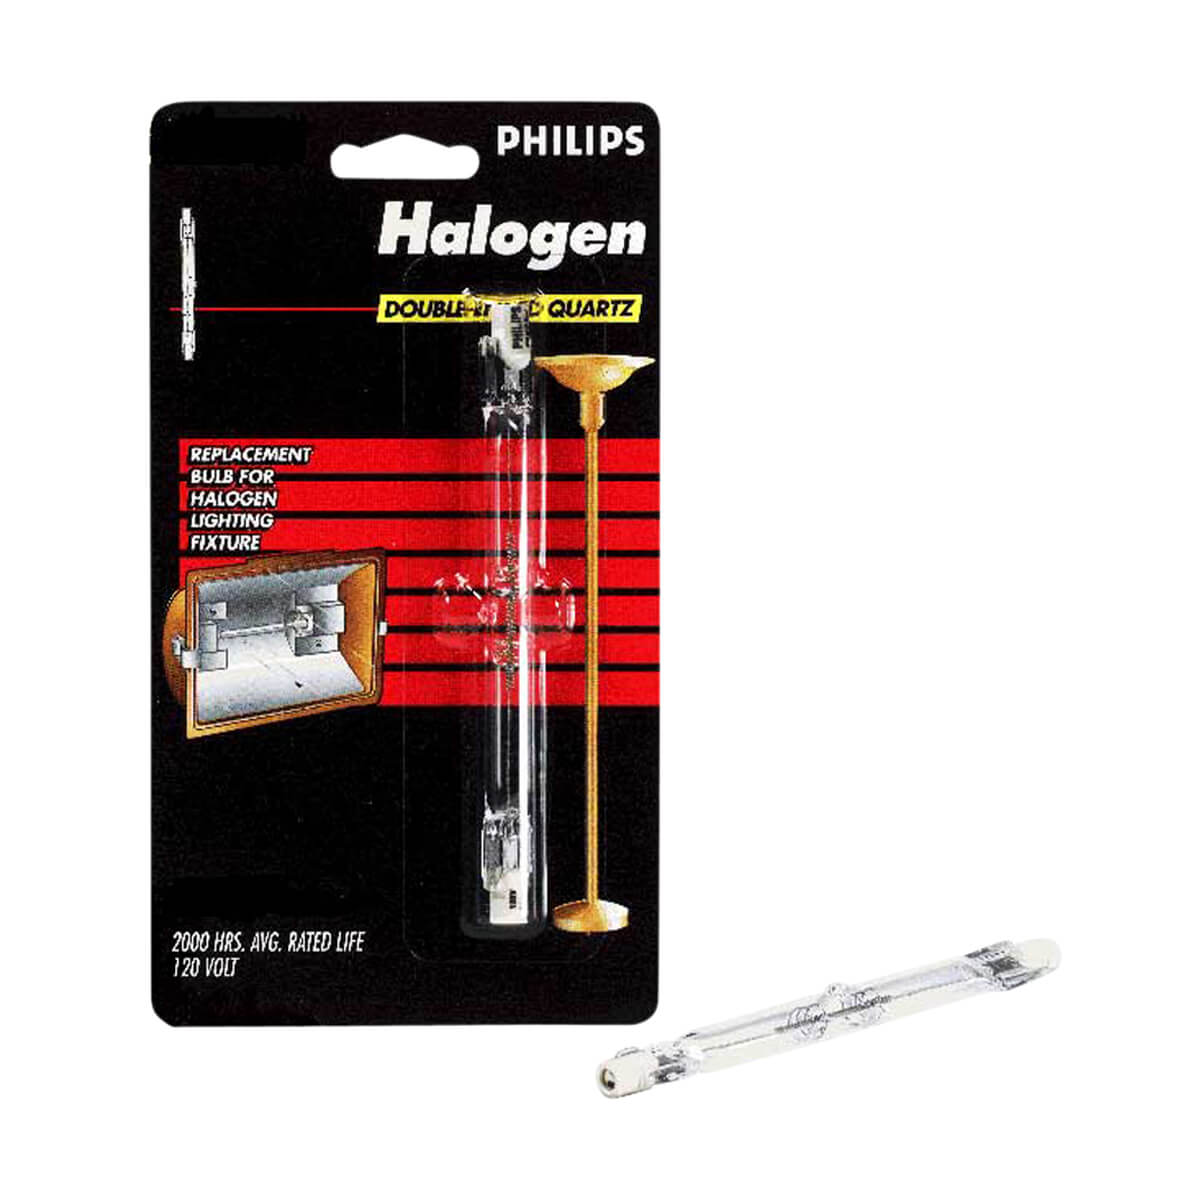 Philips Halogen Tube 300W T3 Quartz 119 mm - 2 pack